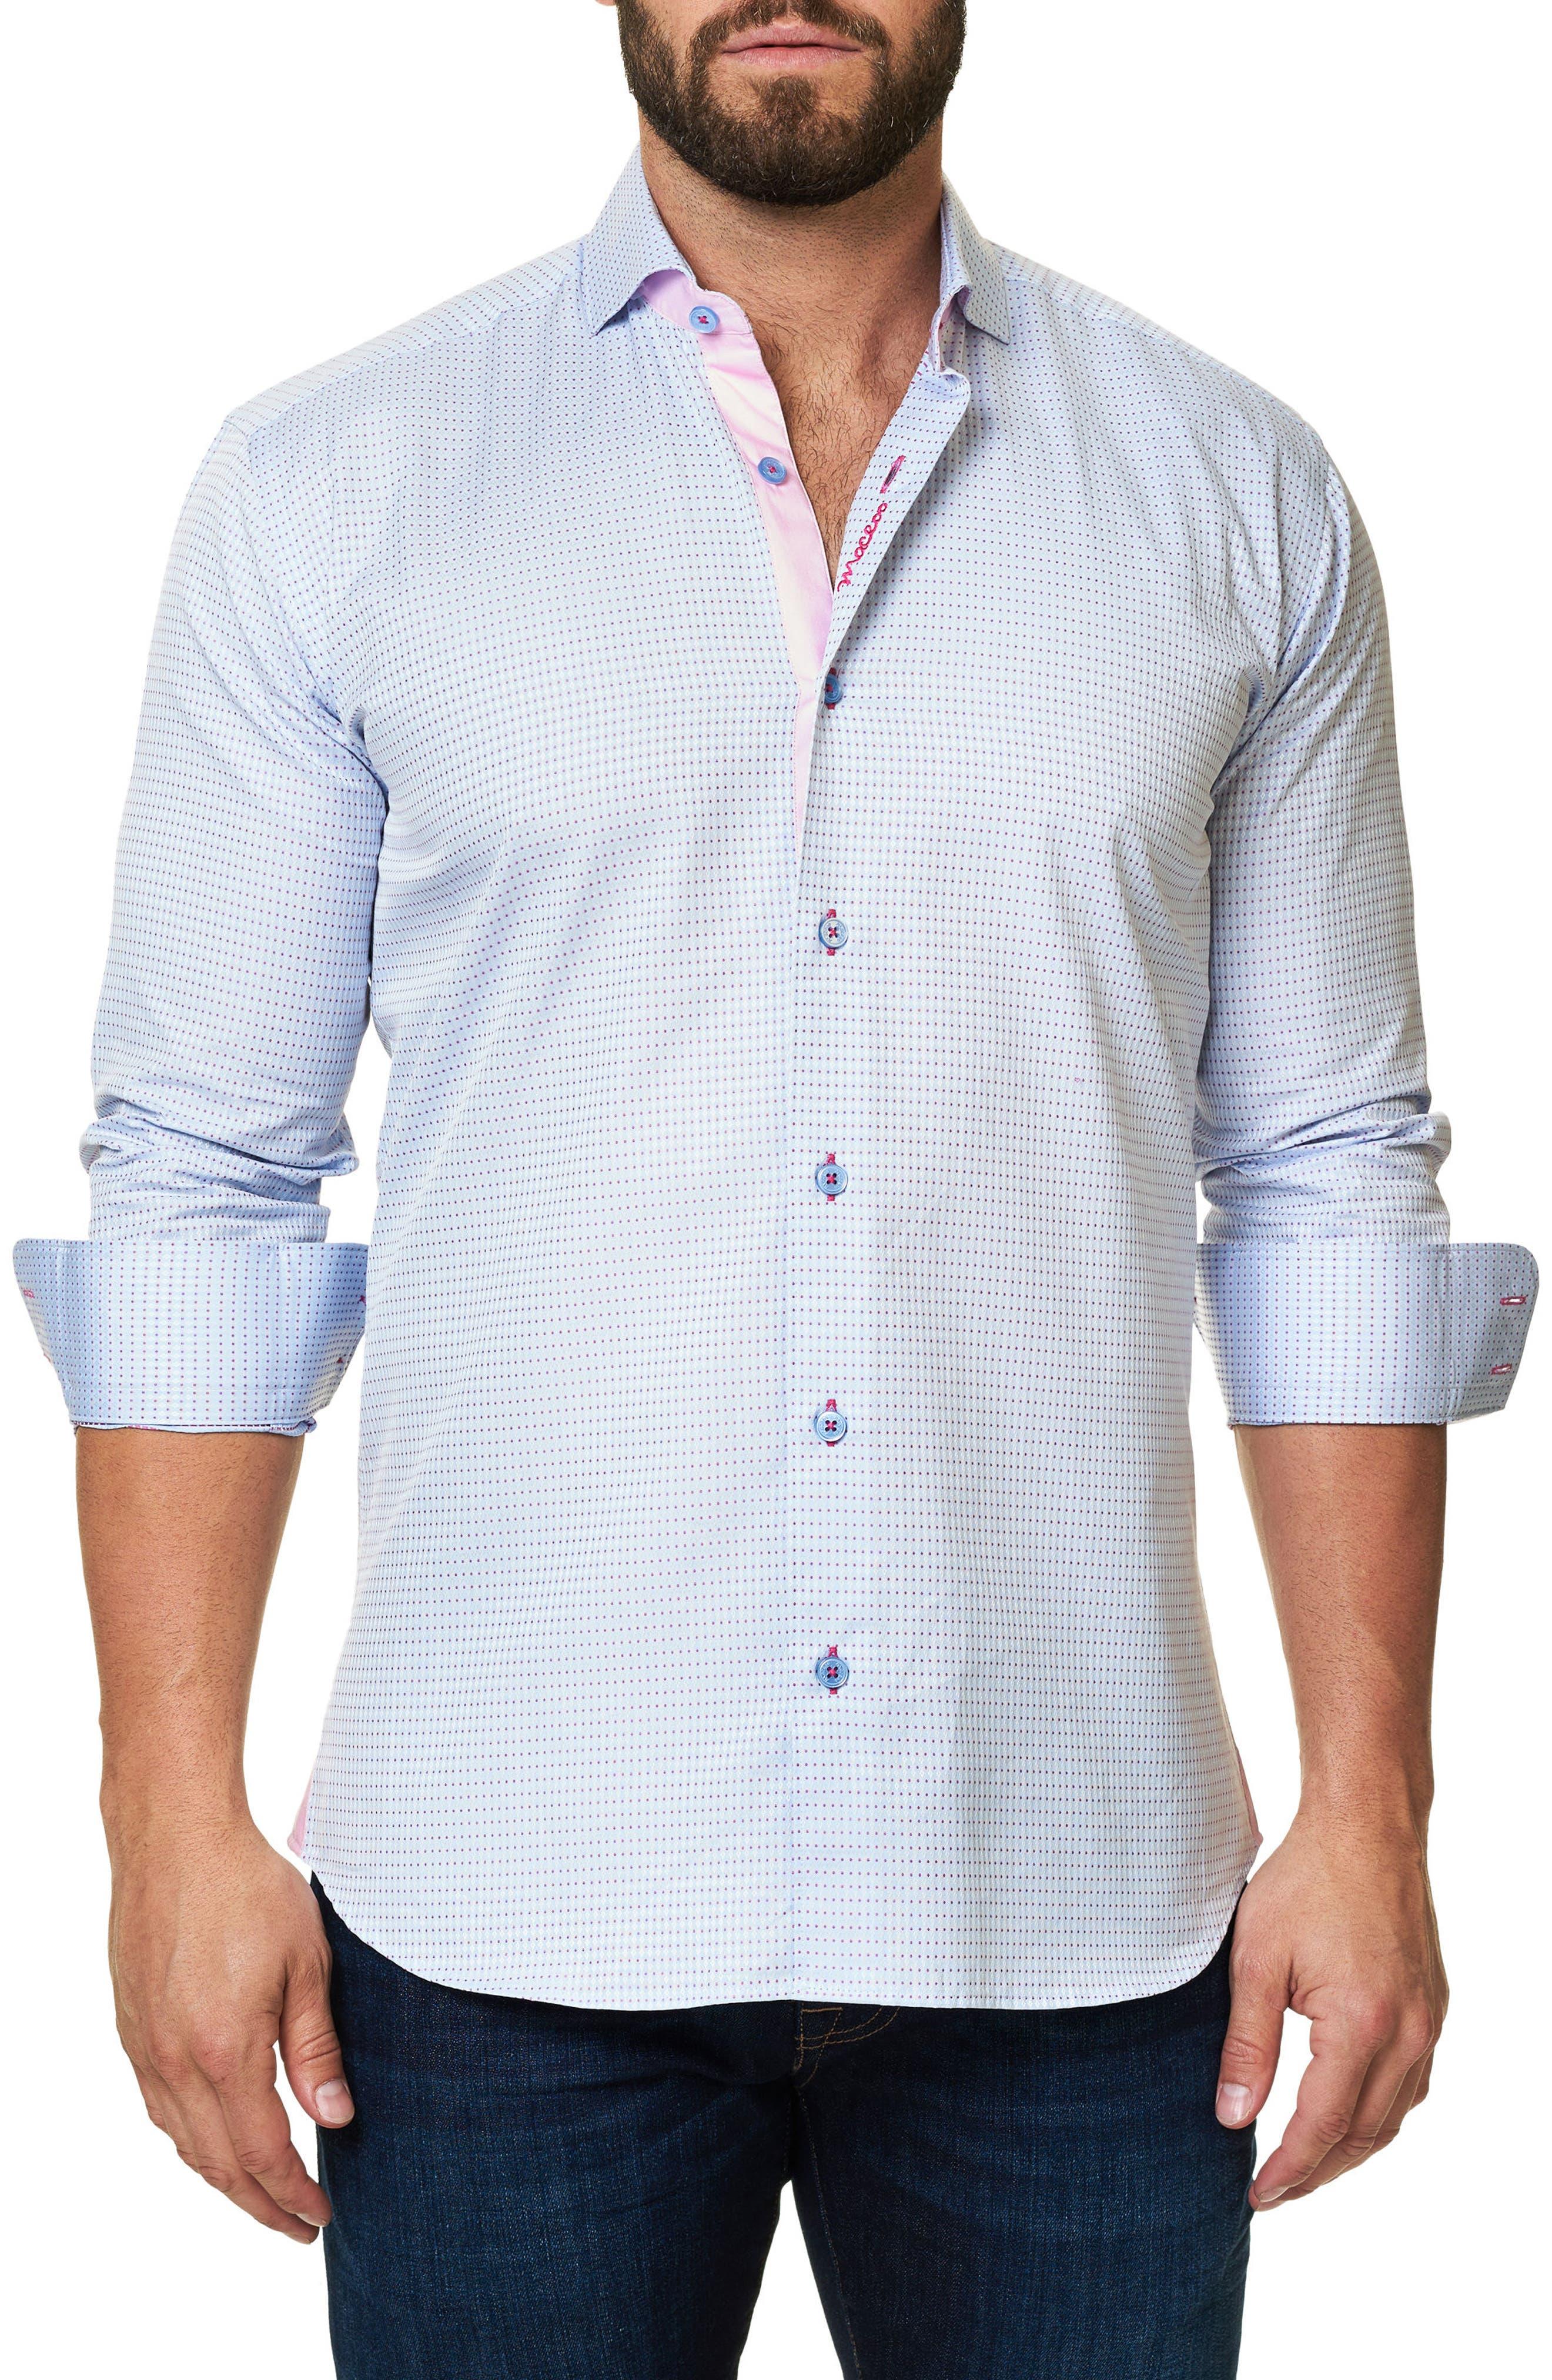 Main Image - Maceoo Trim Fit Dot Print Sport Shirt